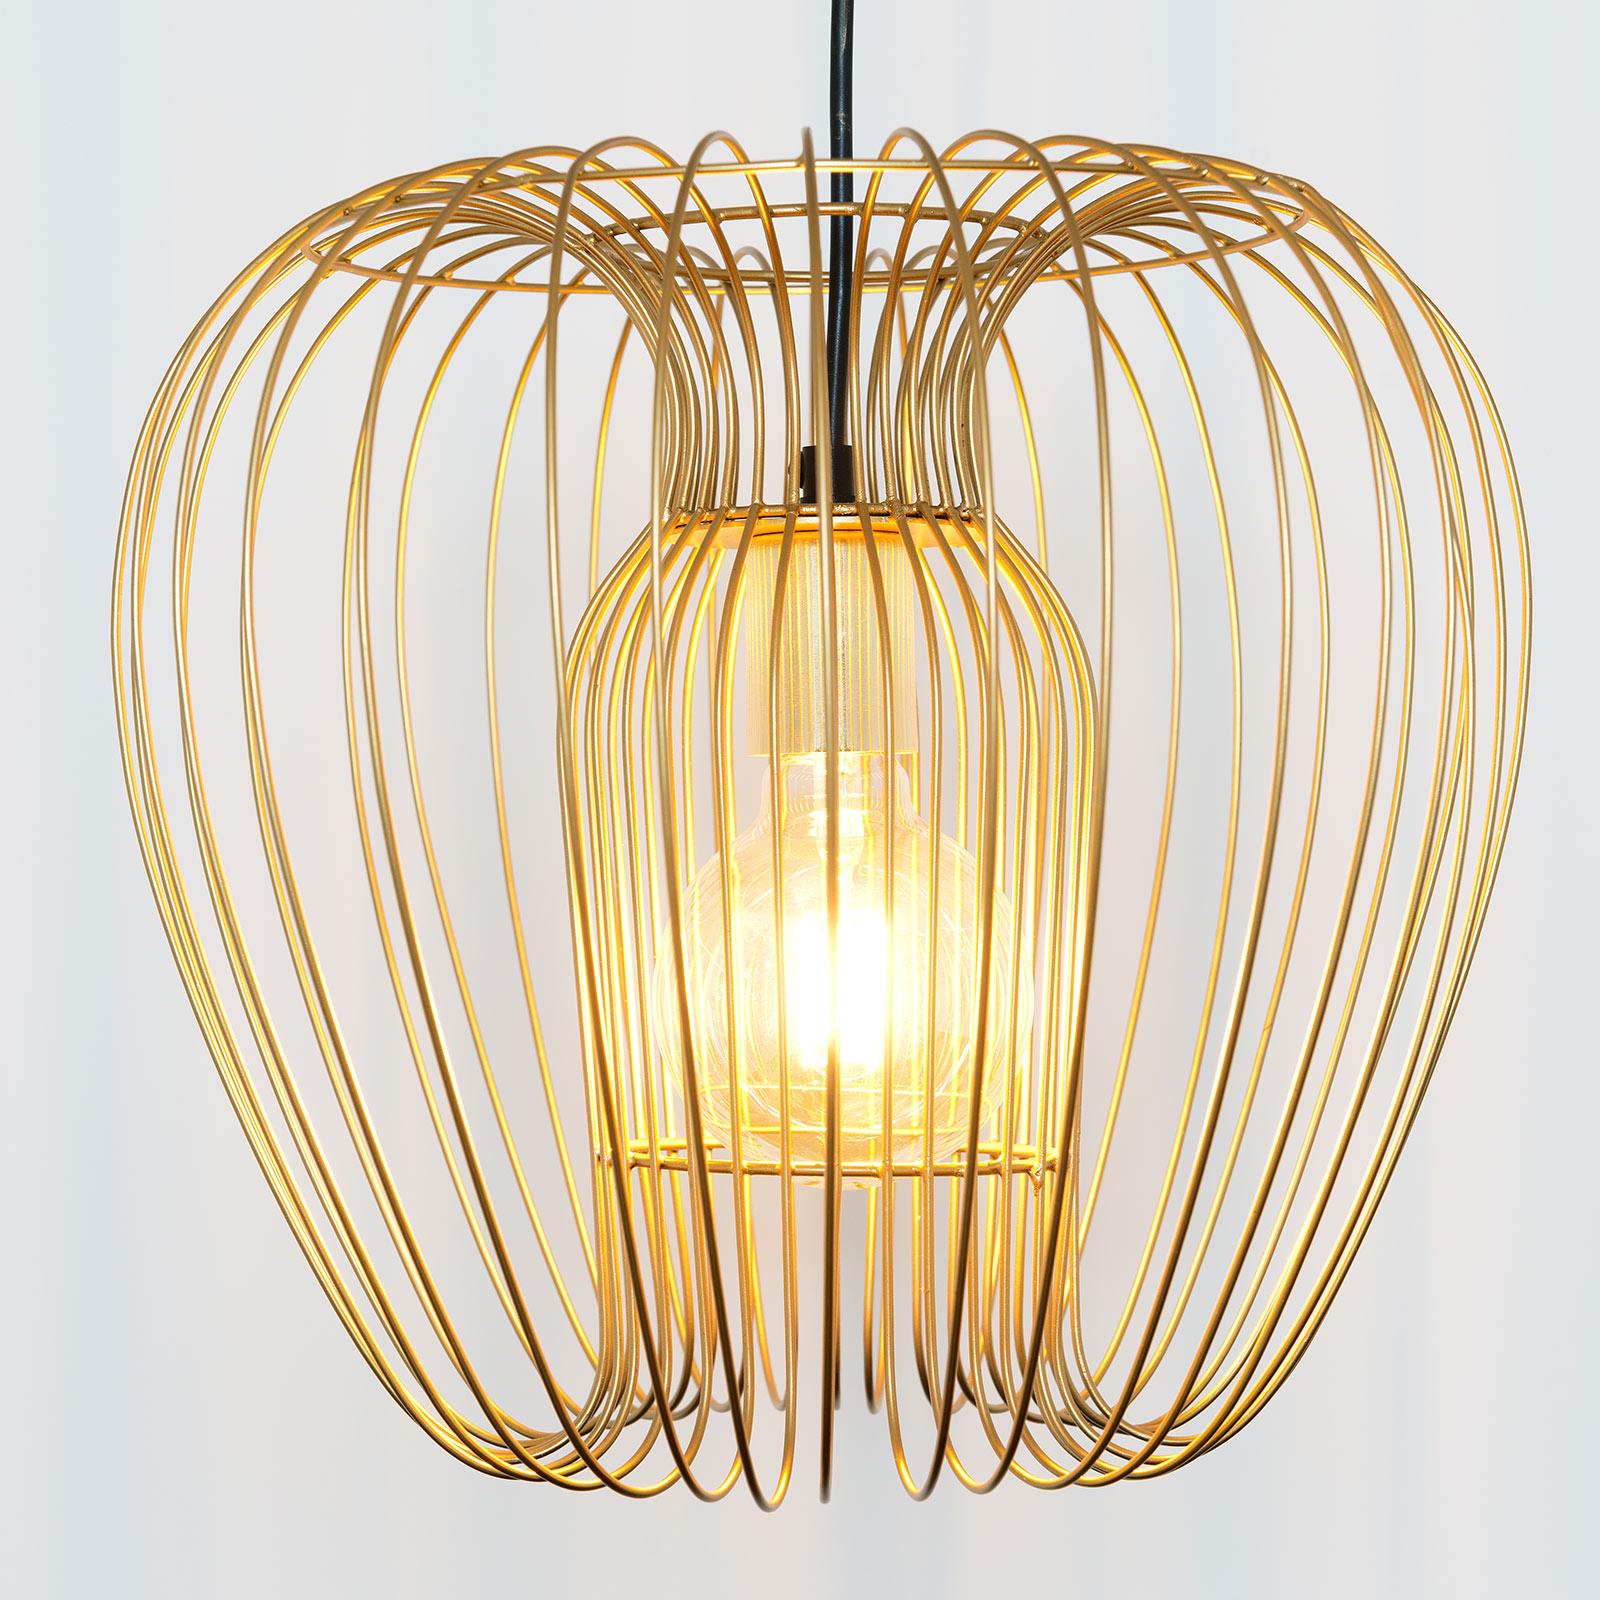 Protetto hængelampe, guld, Ø 34 cm